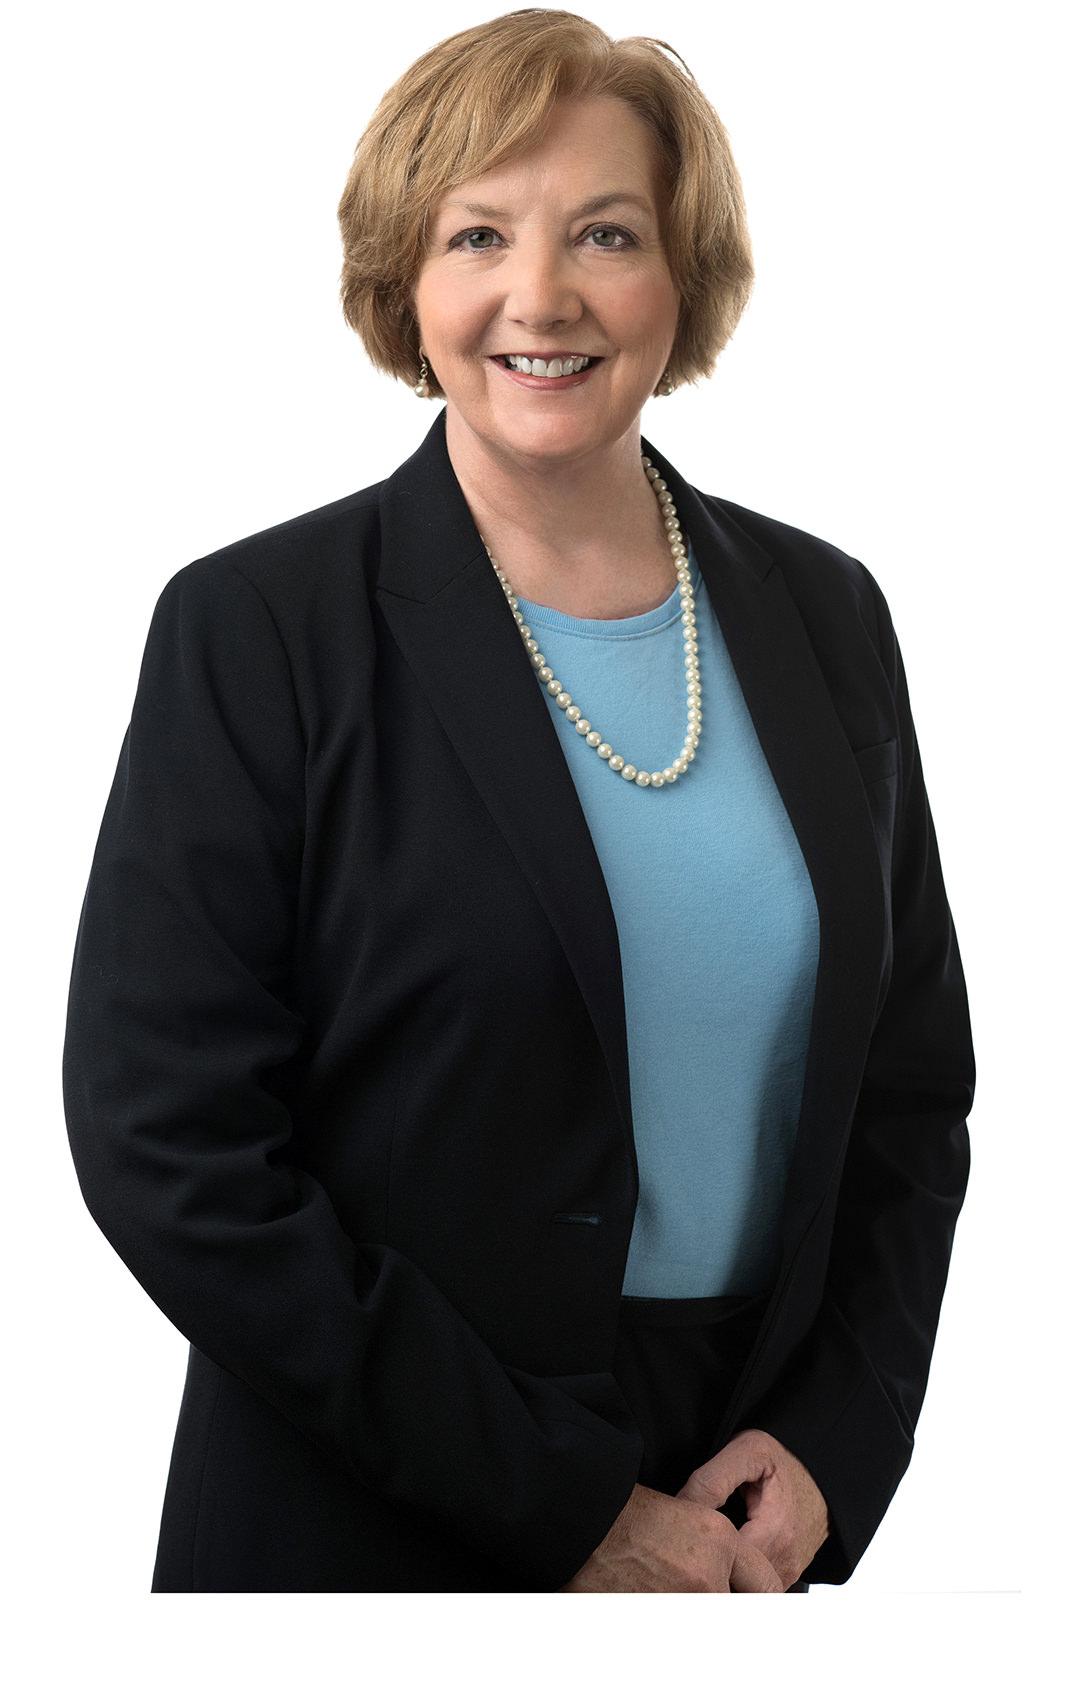 Rose-Marie T. Carlisle